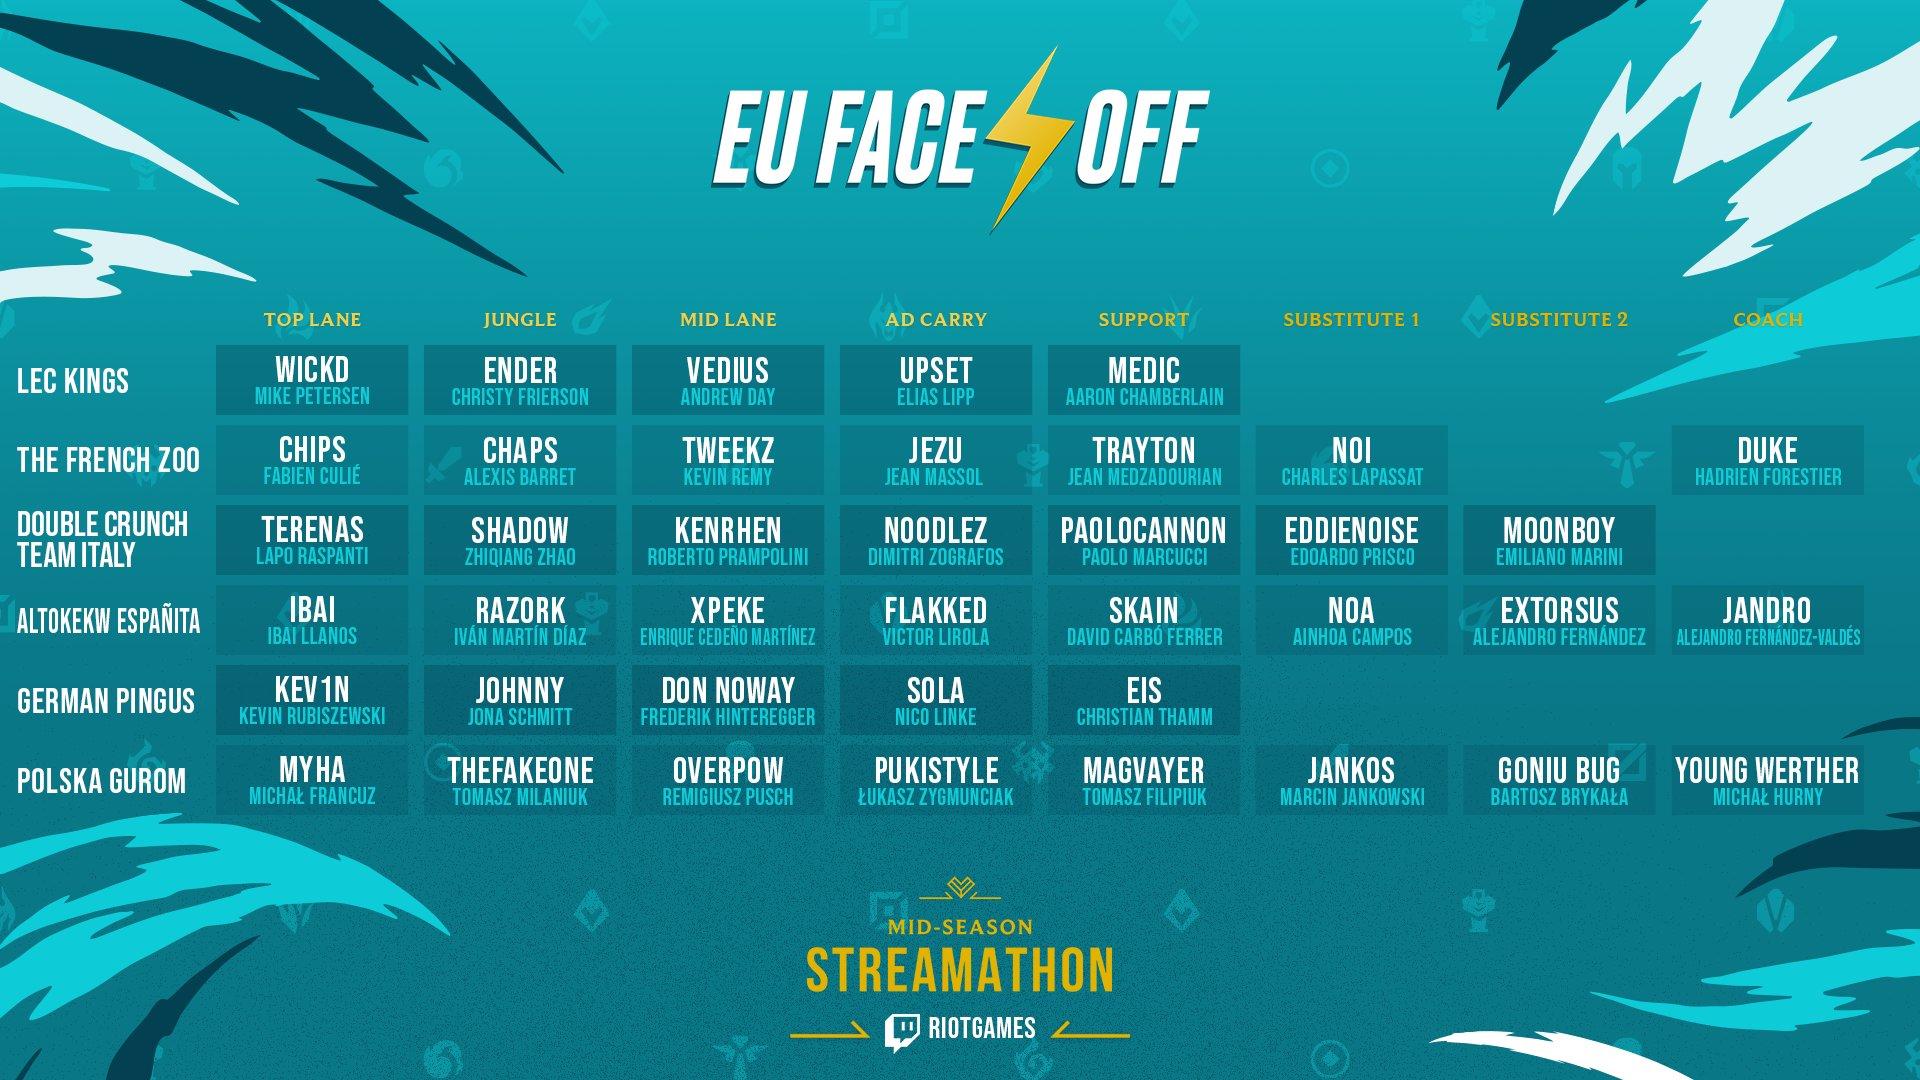 Rest of representatives of the EU Face Off. Source: Riot Games